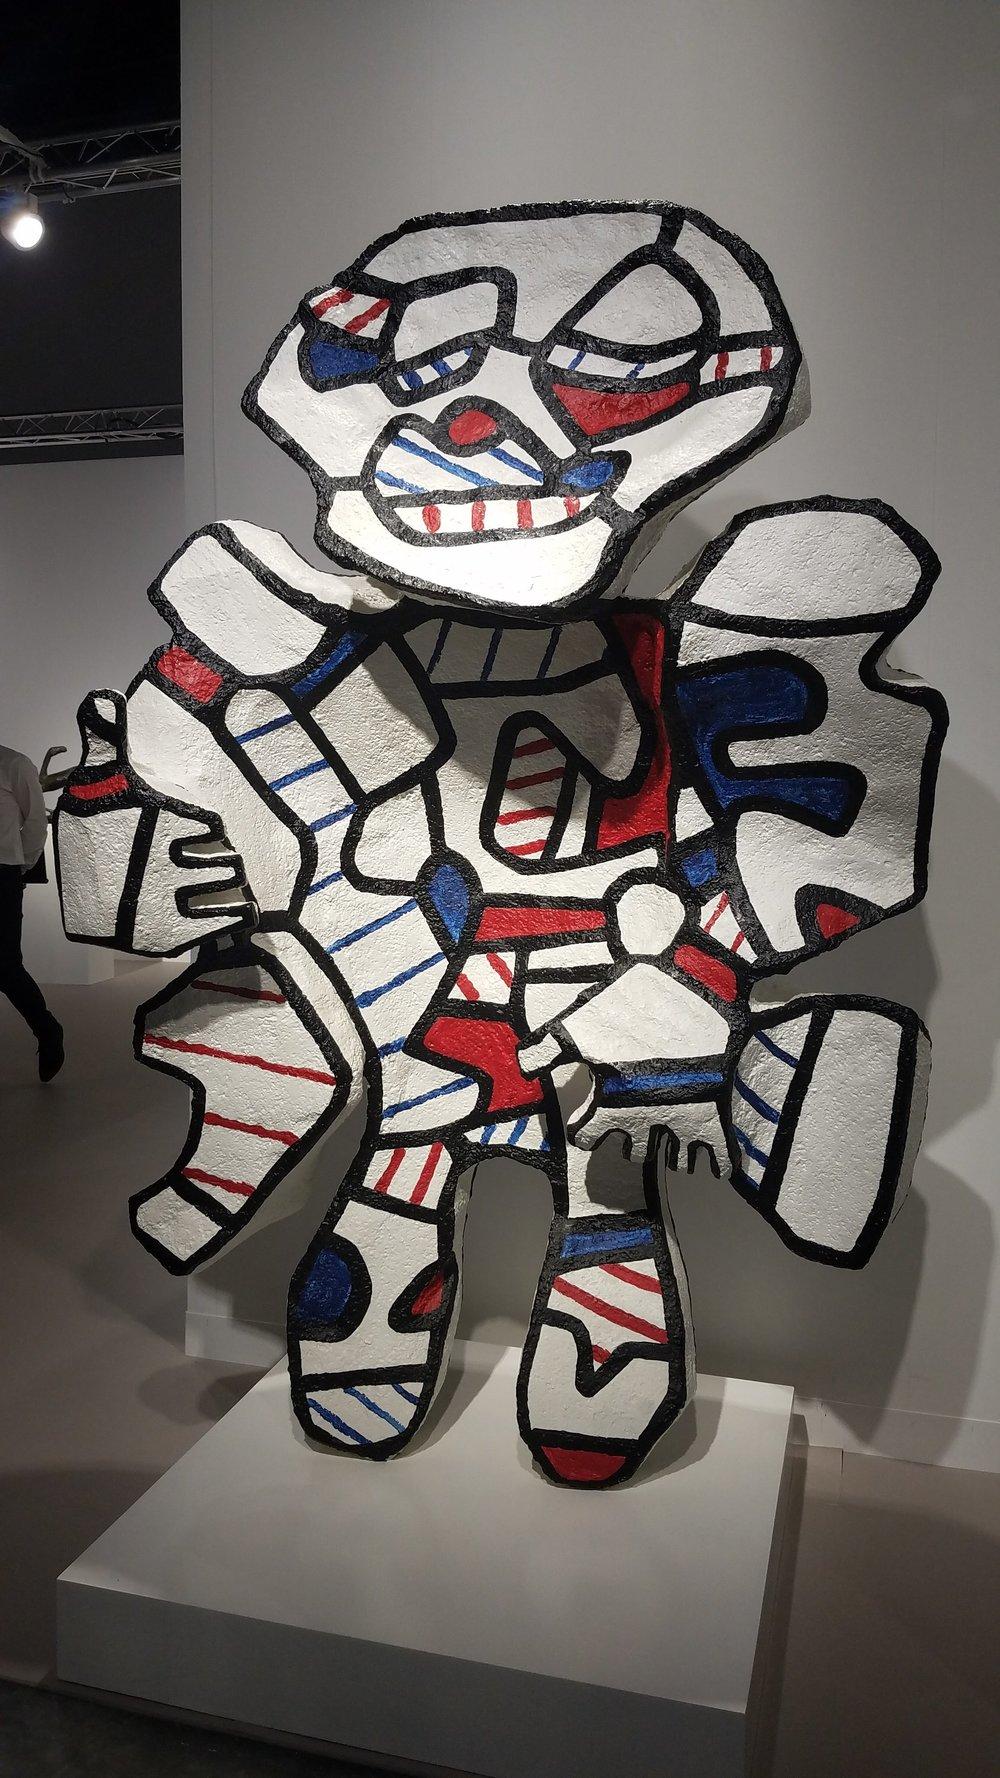 Jean Dubuffet, Waddington Custot Gallery